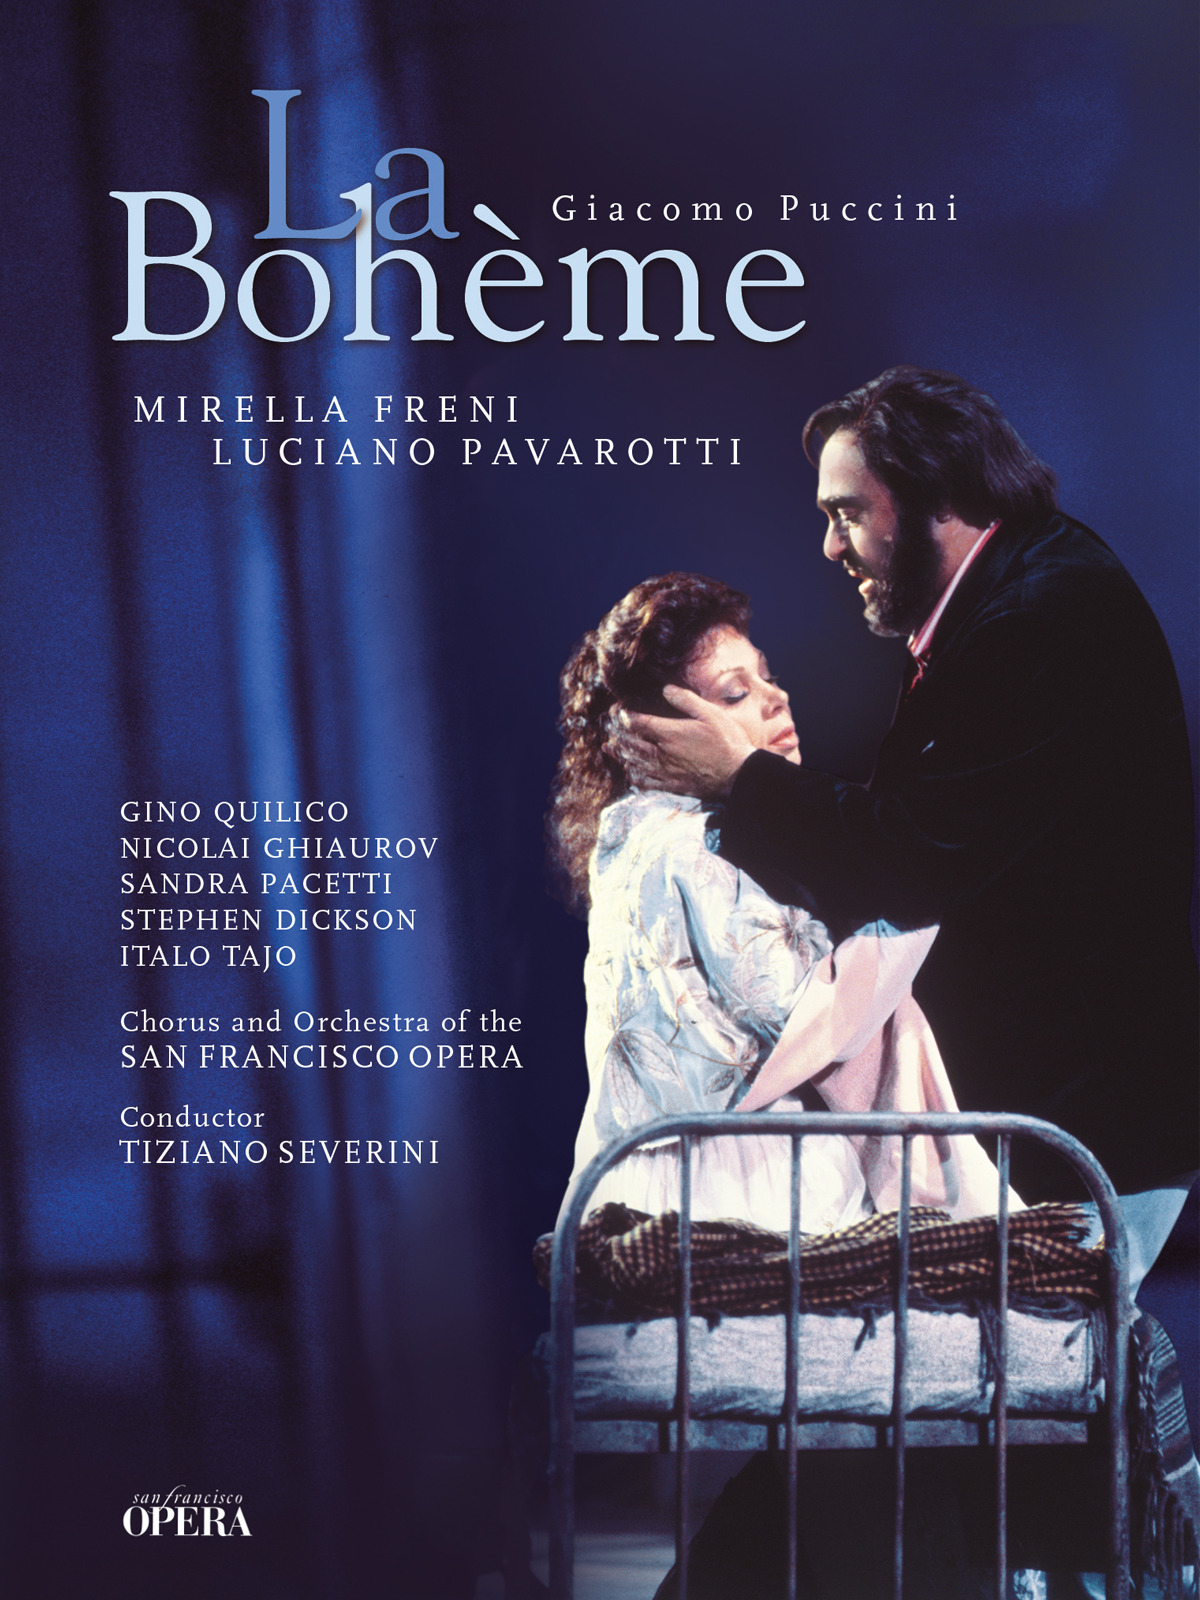 La Bohème | Giacomo Puccini | San Francisco Opera House | Mirella Freni, Luciano Pavarotti | Arthaus Musik [OV]